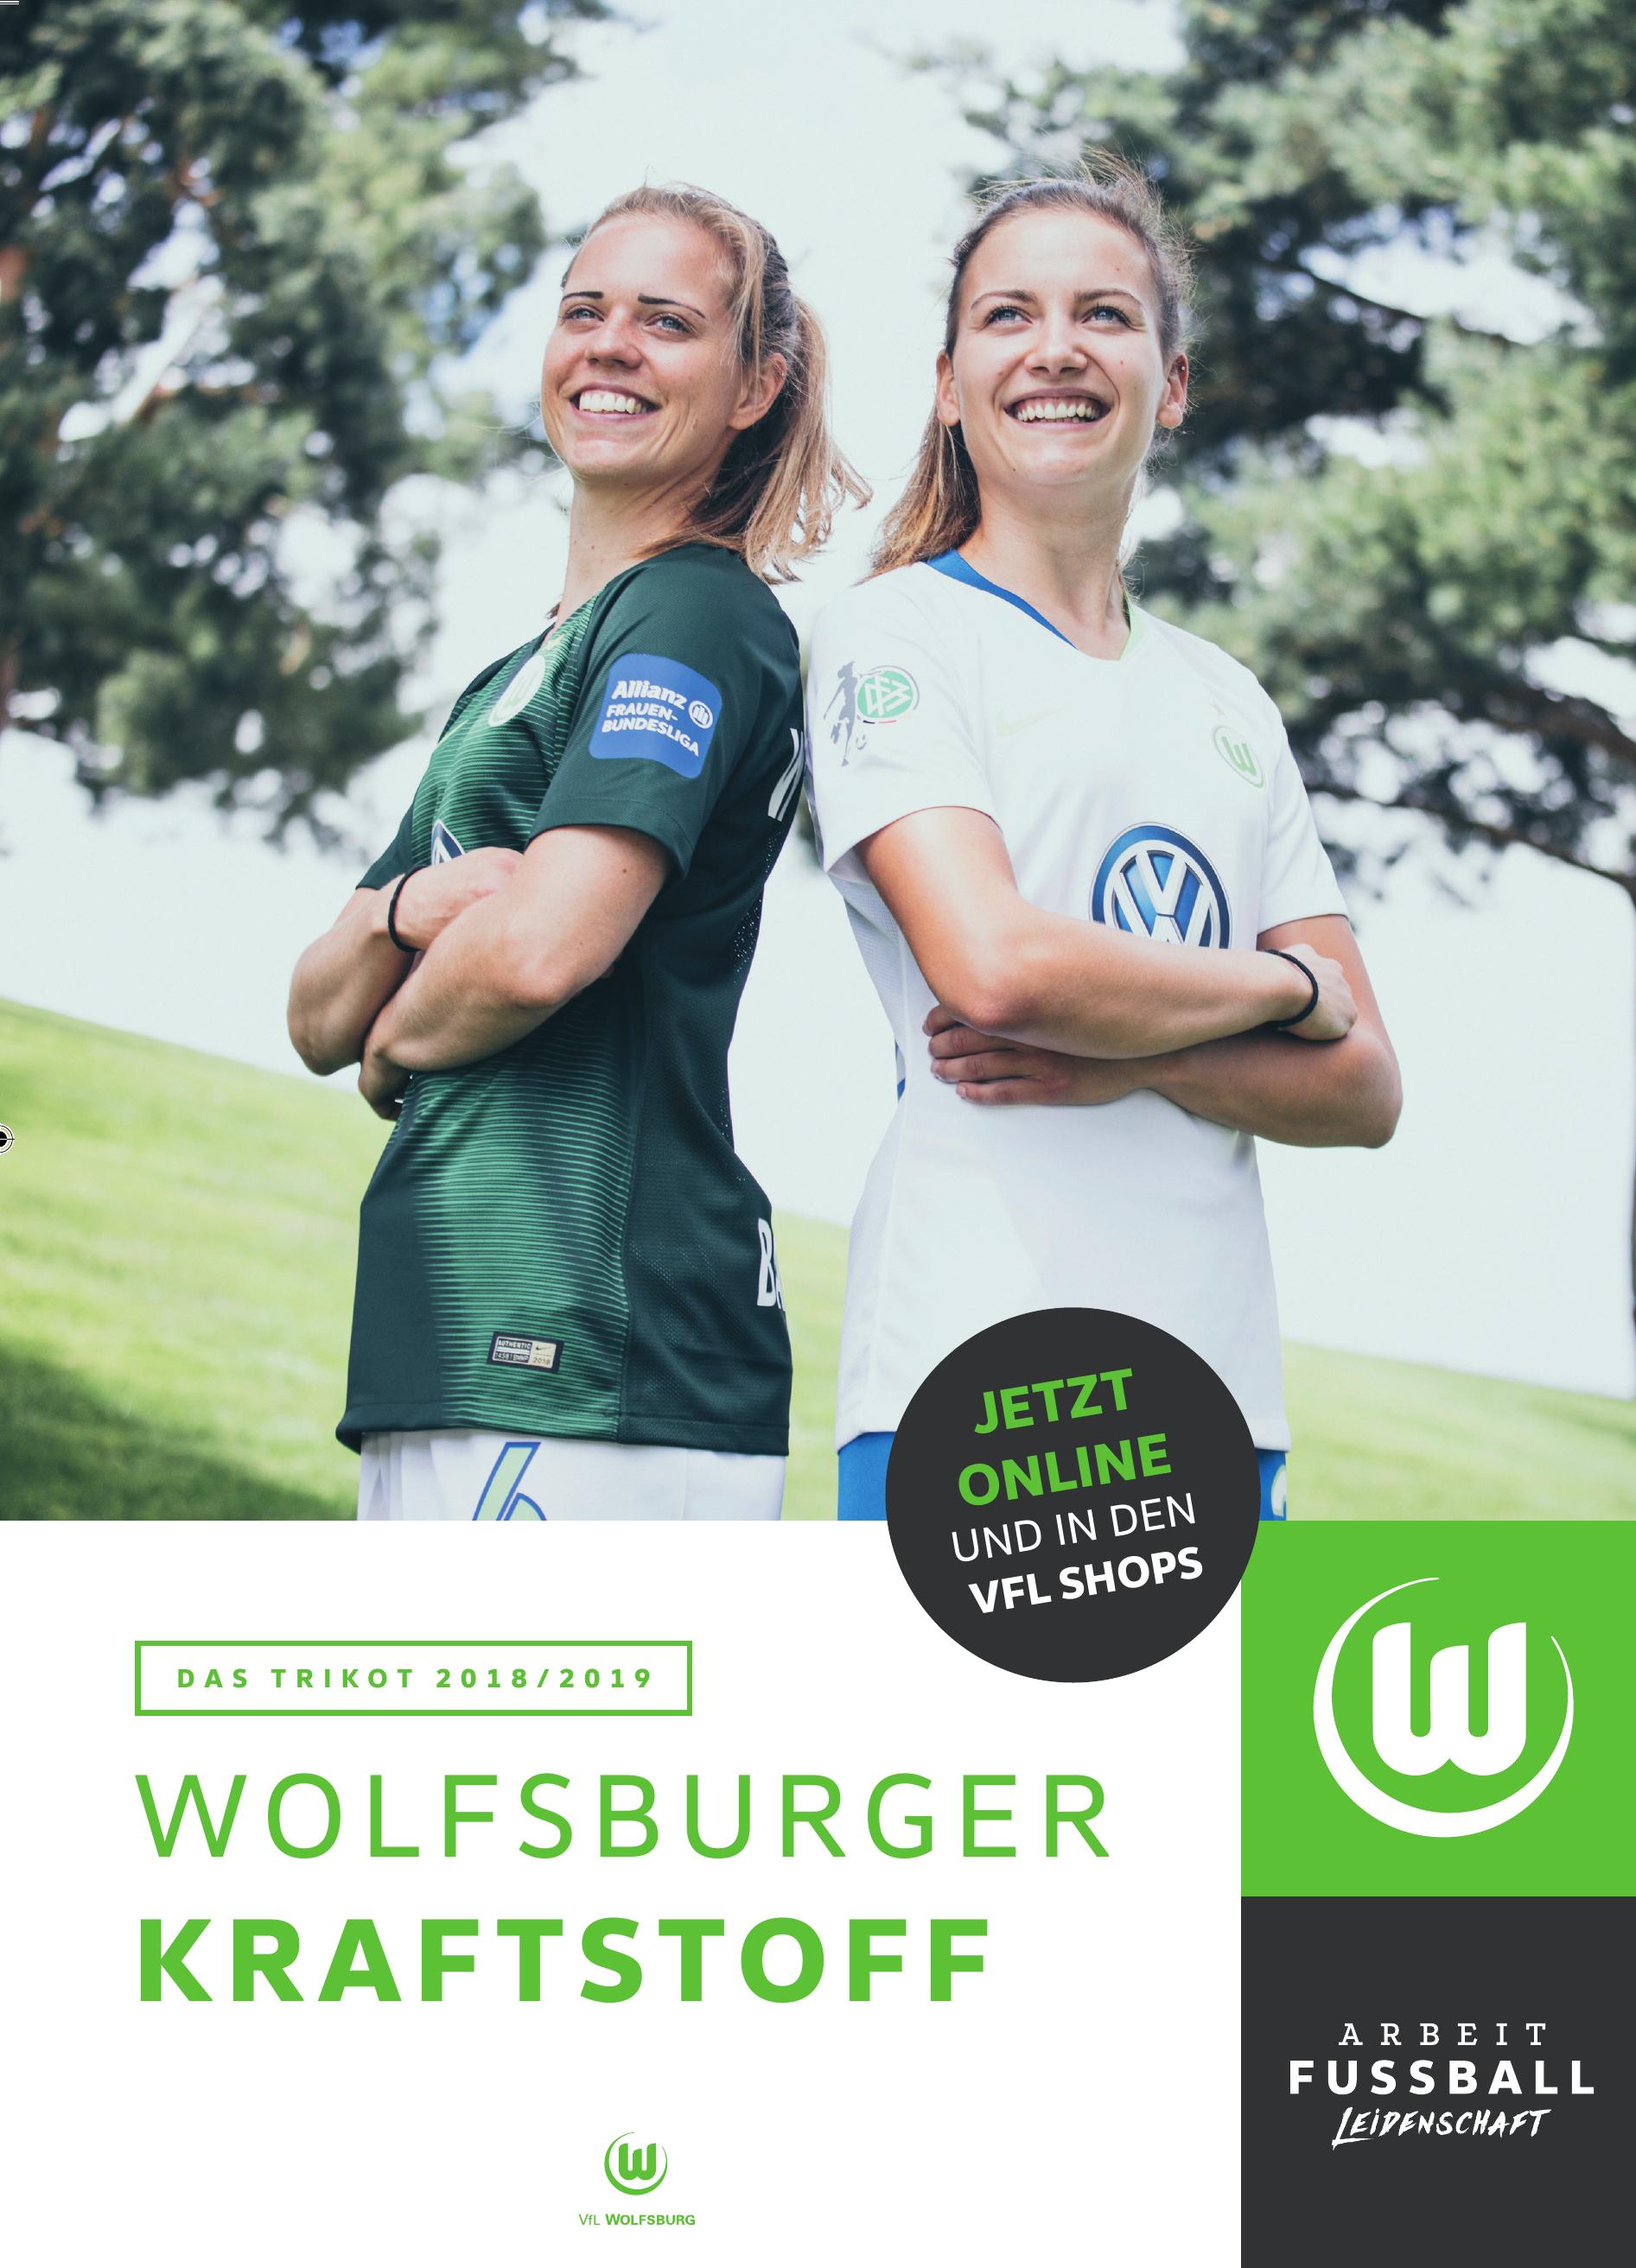 Wolfsburger Kraftstoff